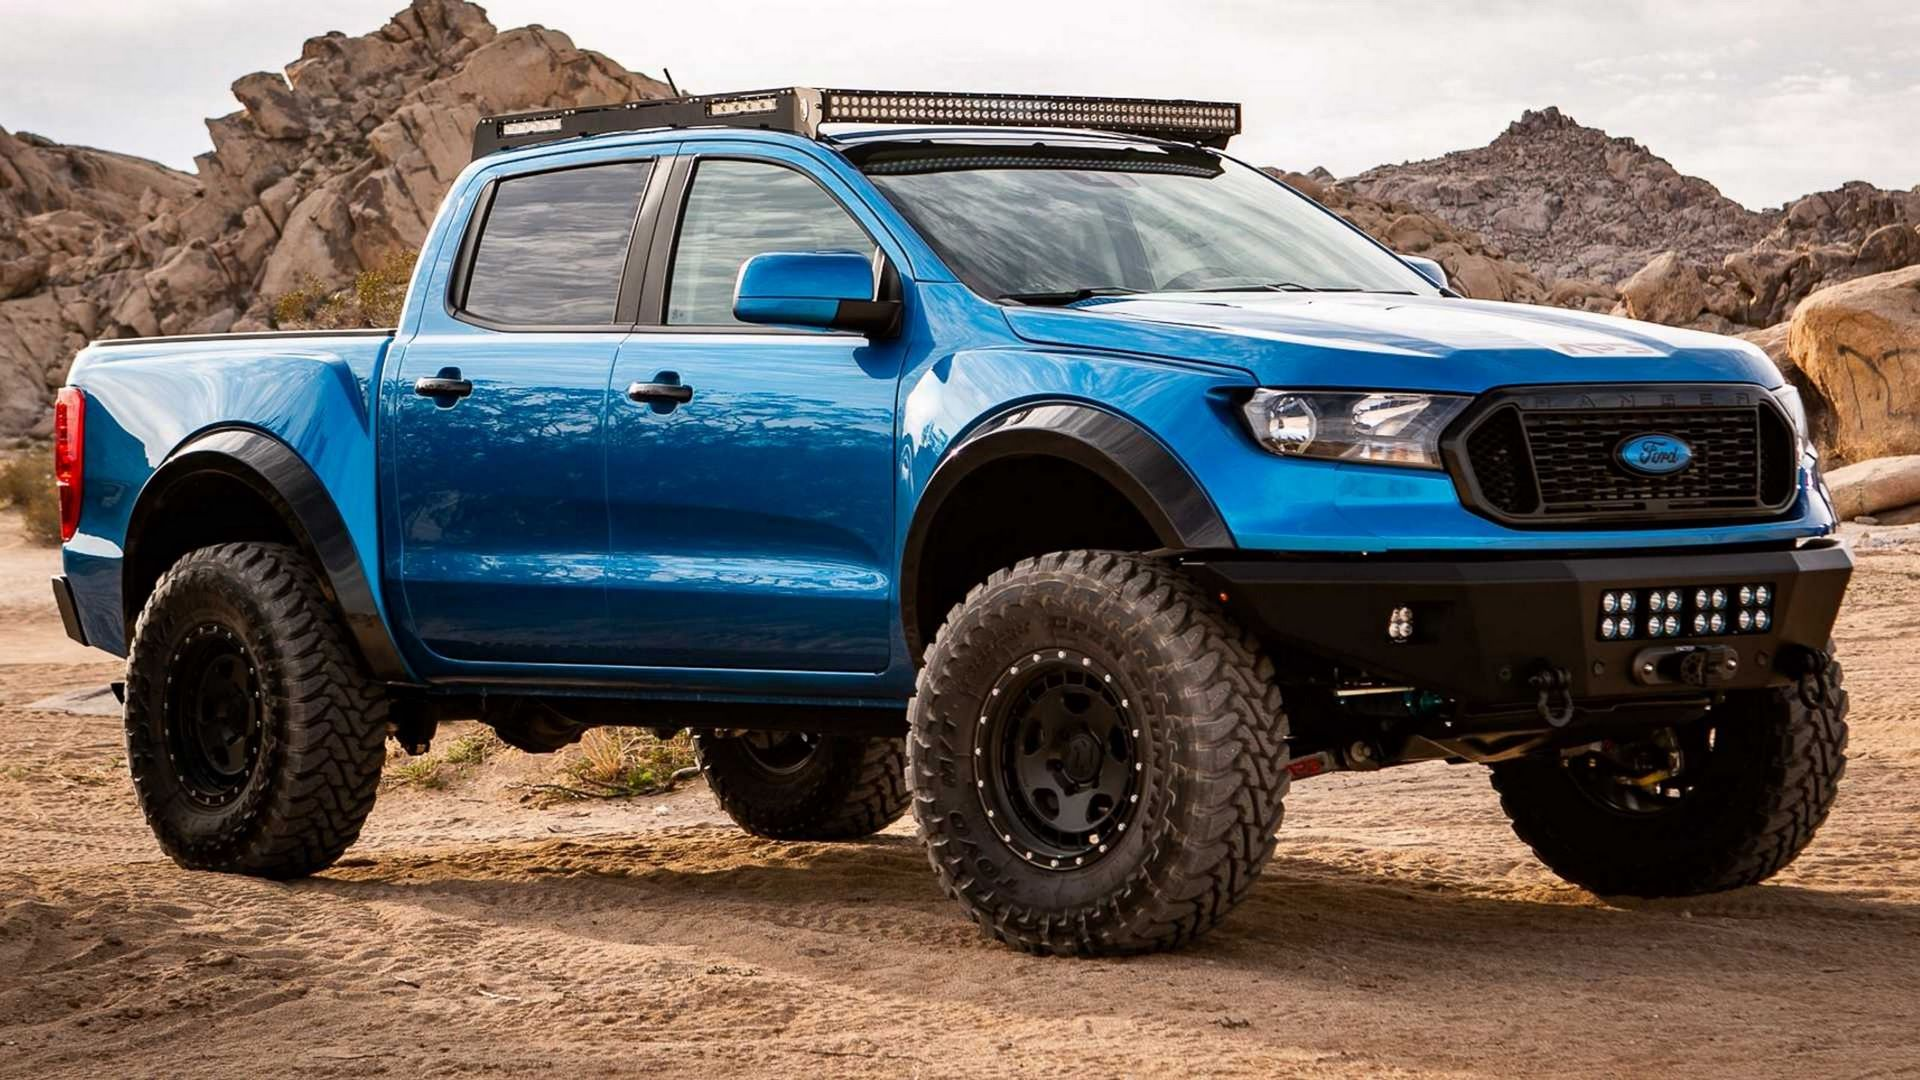 Ford-Ranger-Prorunner-By-APG-1